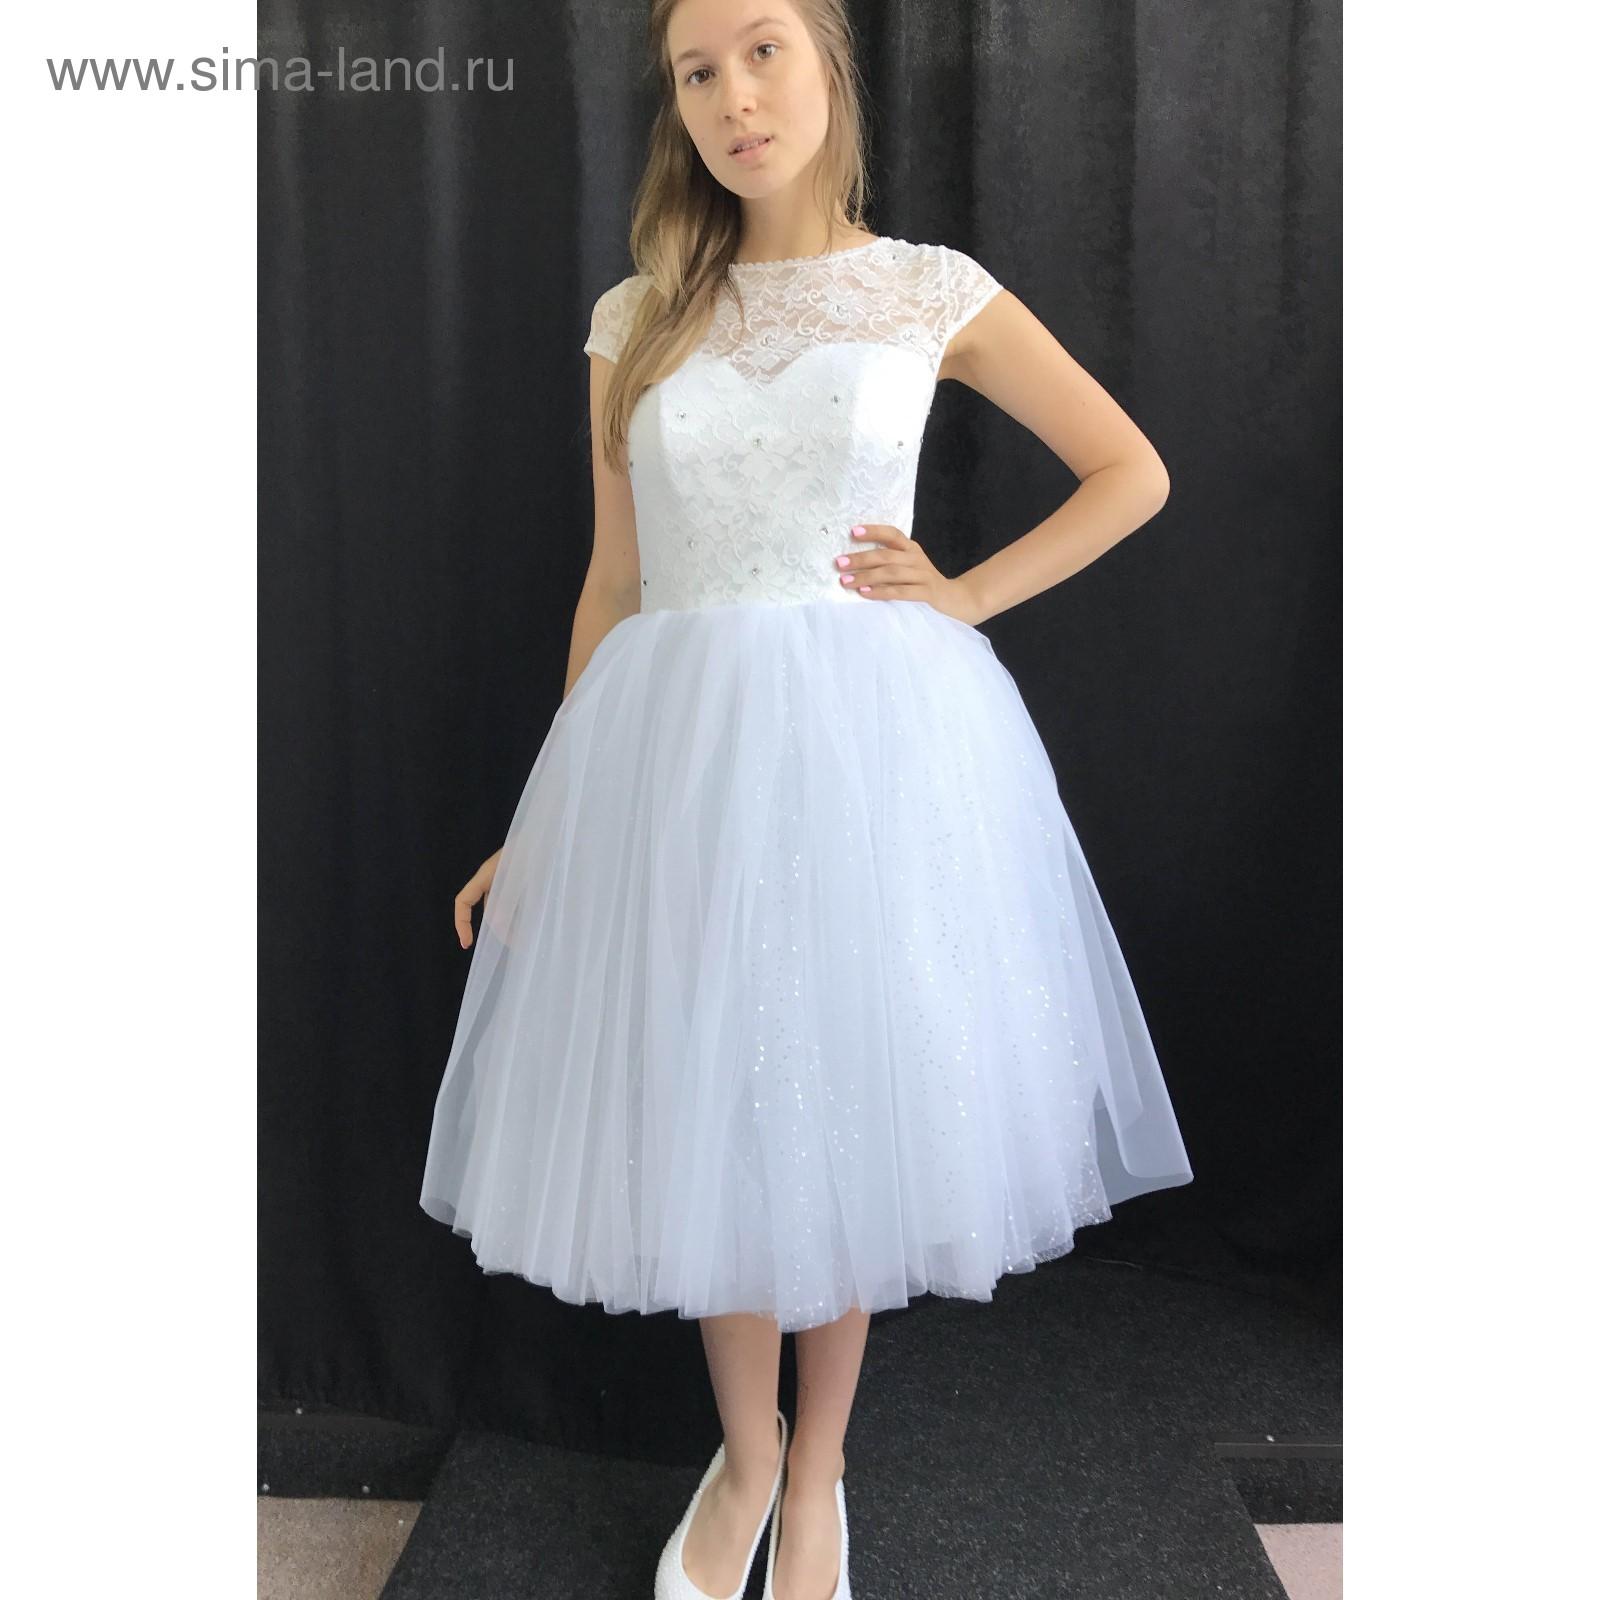 8d49c3de21a Свадебное платье